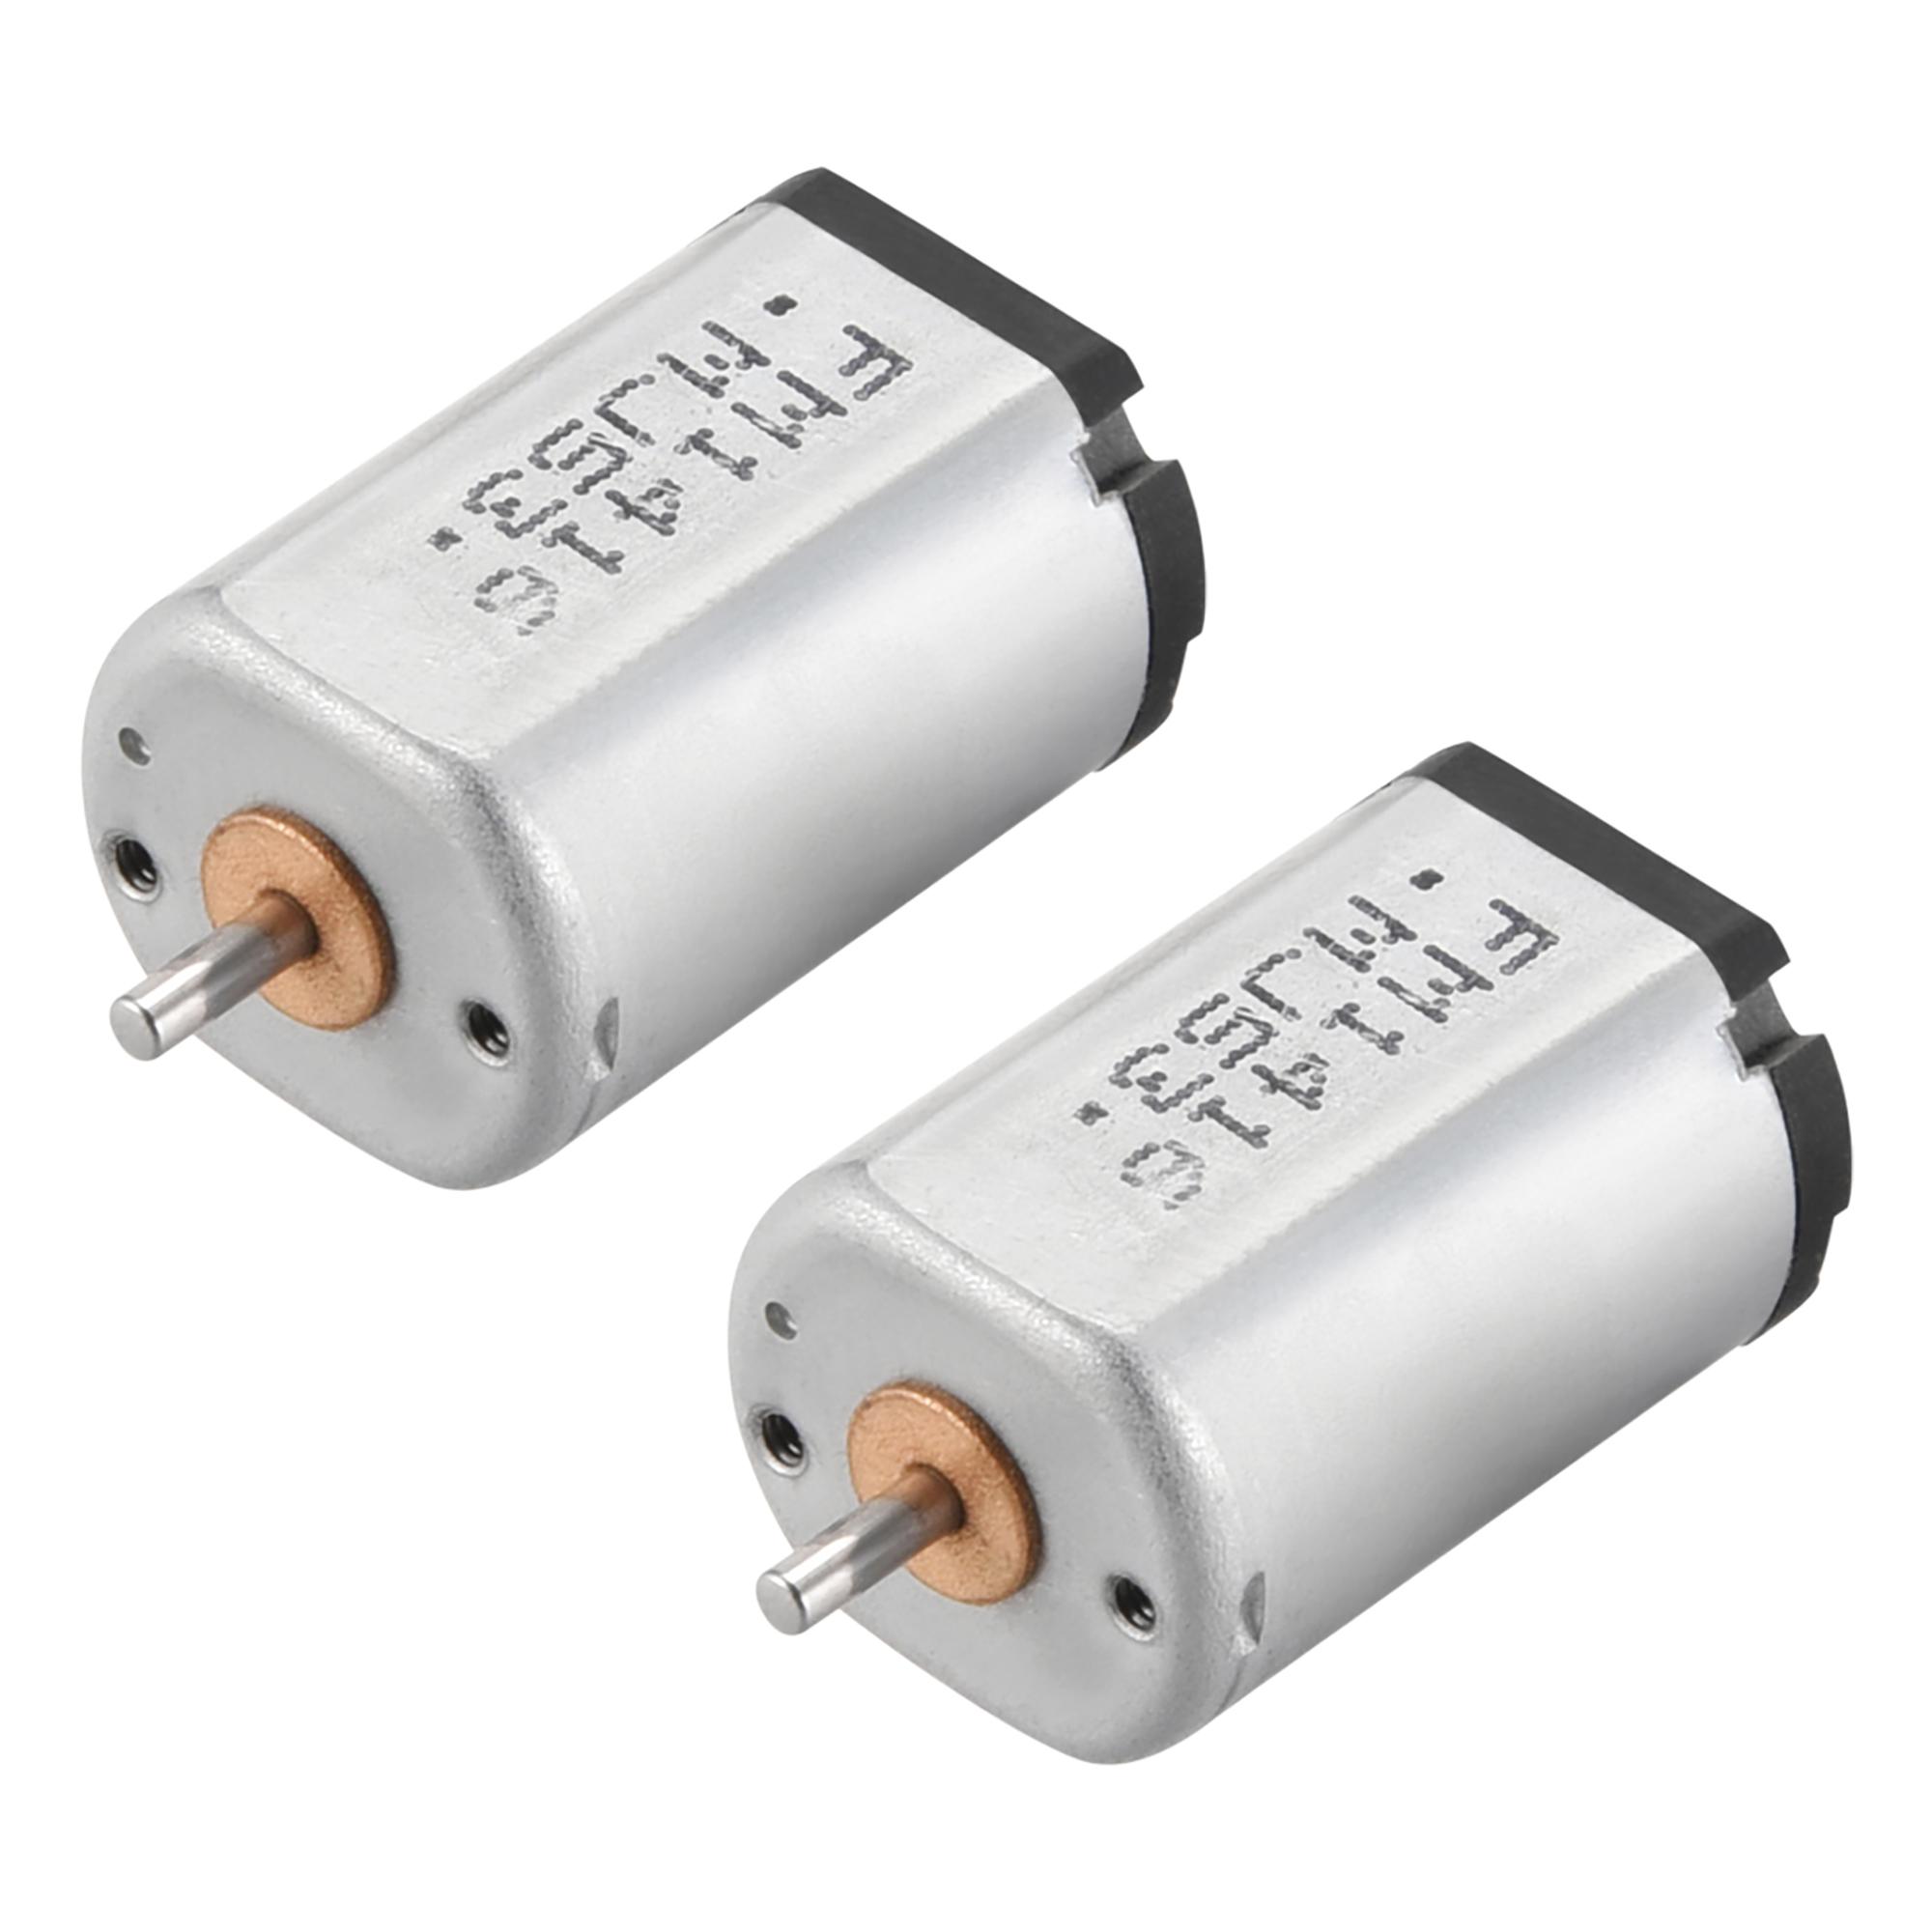 2Pcs DC Motor 1.5/4.5V 4500/14000RPM 0.05A Electric Motor Round Shaft